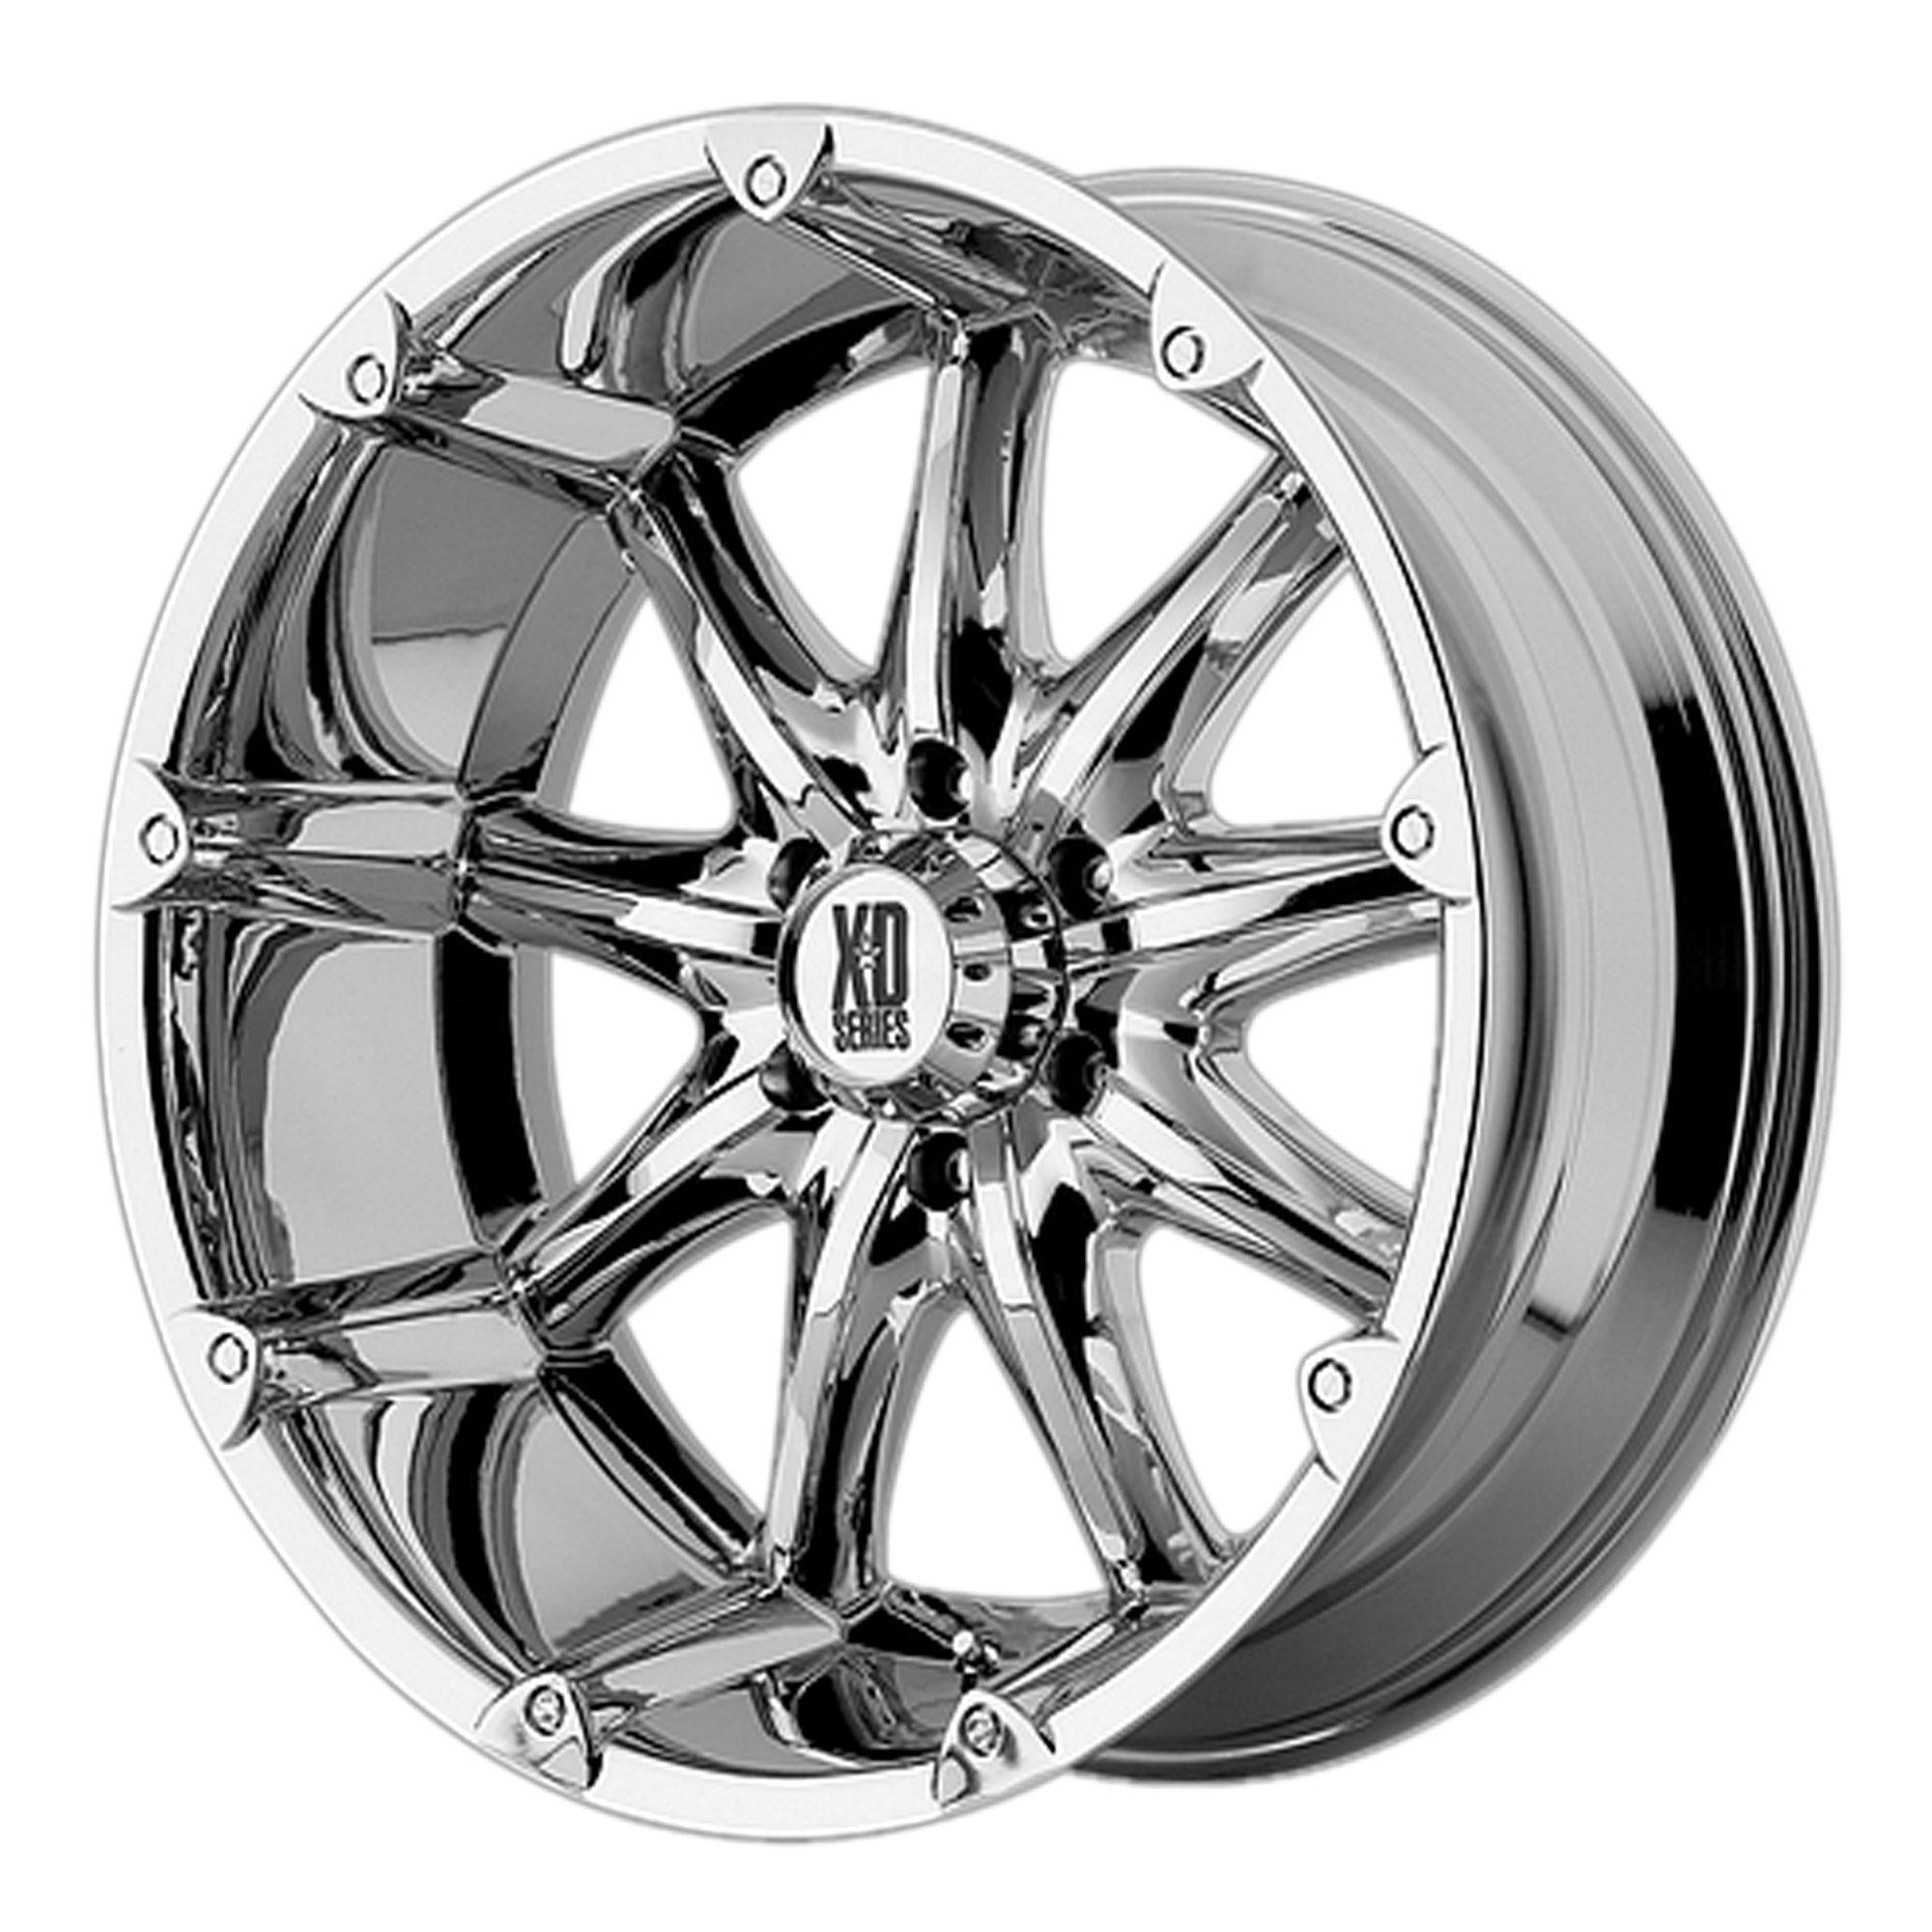 XD Series by KMC Wheels XD779 Badlands Chrome Wheel (18x9''/8x170mm, +18mm offset)